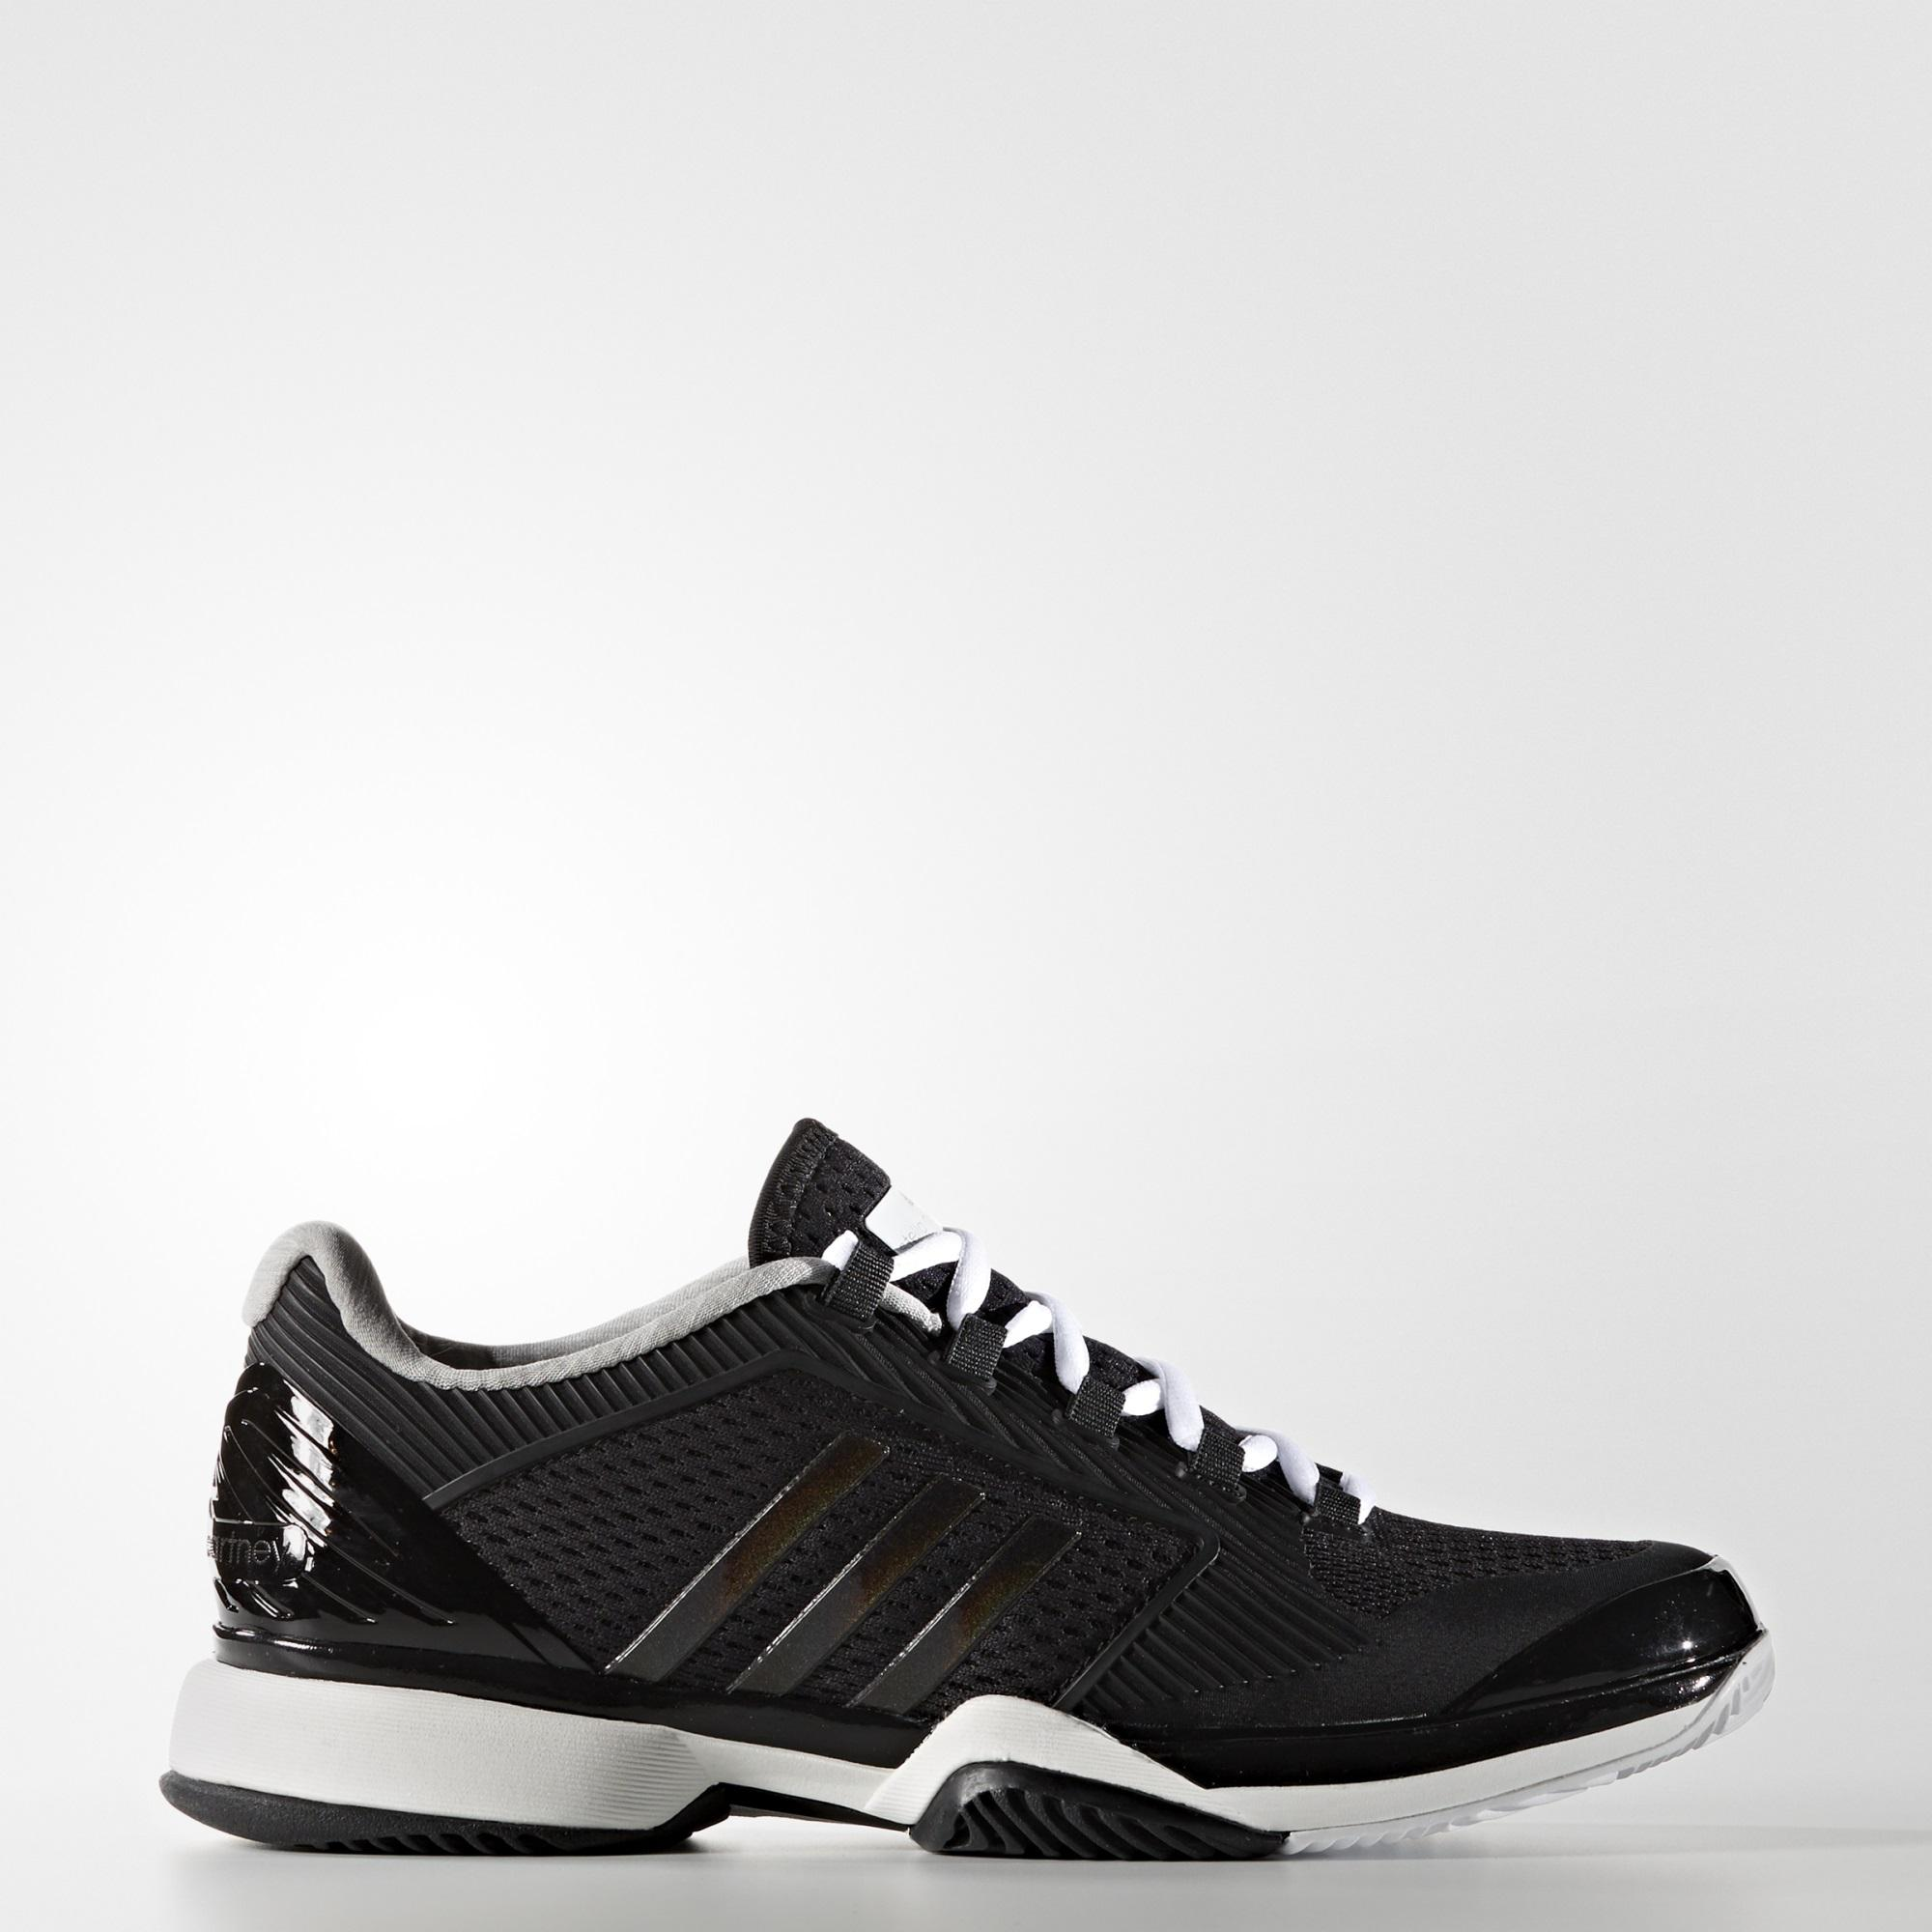 new product 63cfc 04e1d Adidas Womens SMC Barricade 2016 Tennis Shoes - Black - Tenn